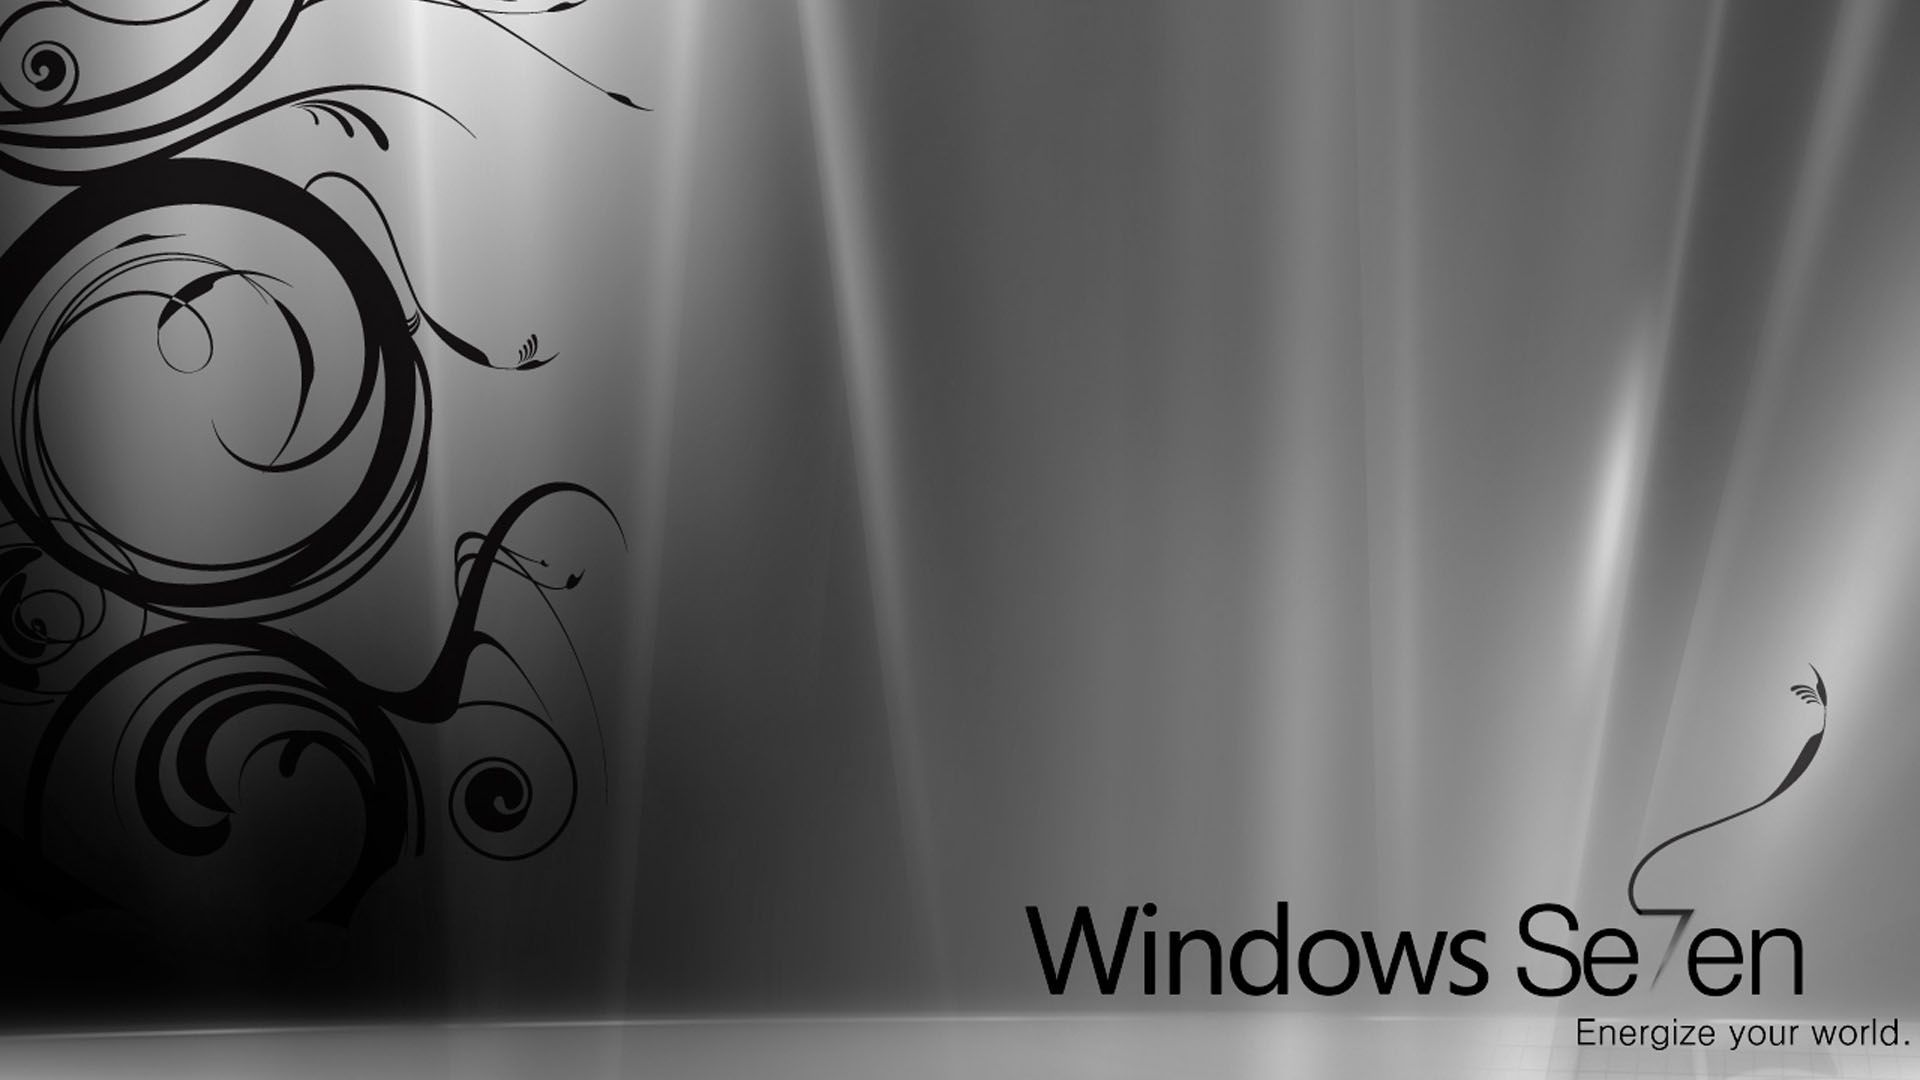 Windows Hd Wallpapers P Wallpaper 1680 1050 Hd Windows 7 Wallpapers 1080p 43 Wallpapers Windows Wallpaper Desktop Background Art Black And White Wallpaper